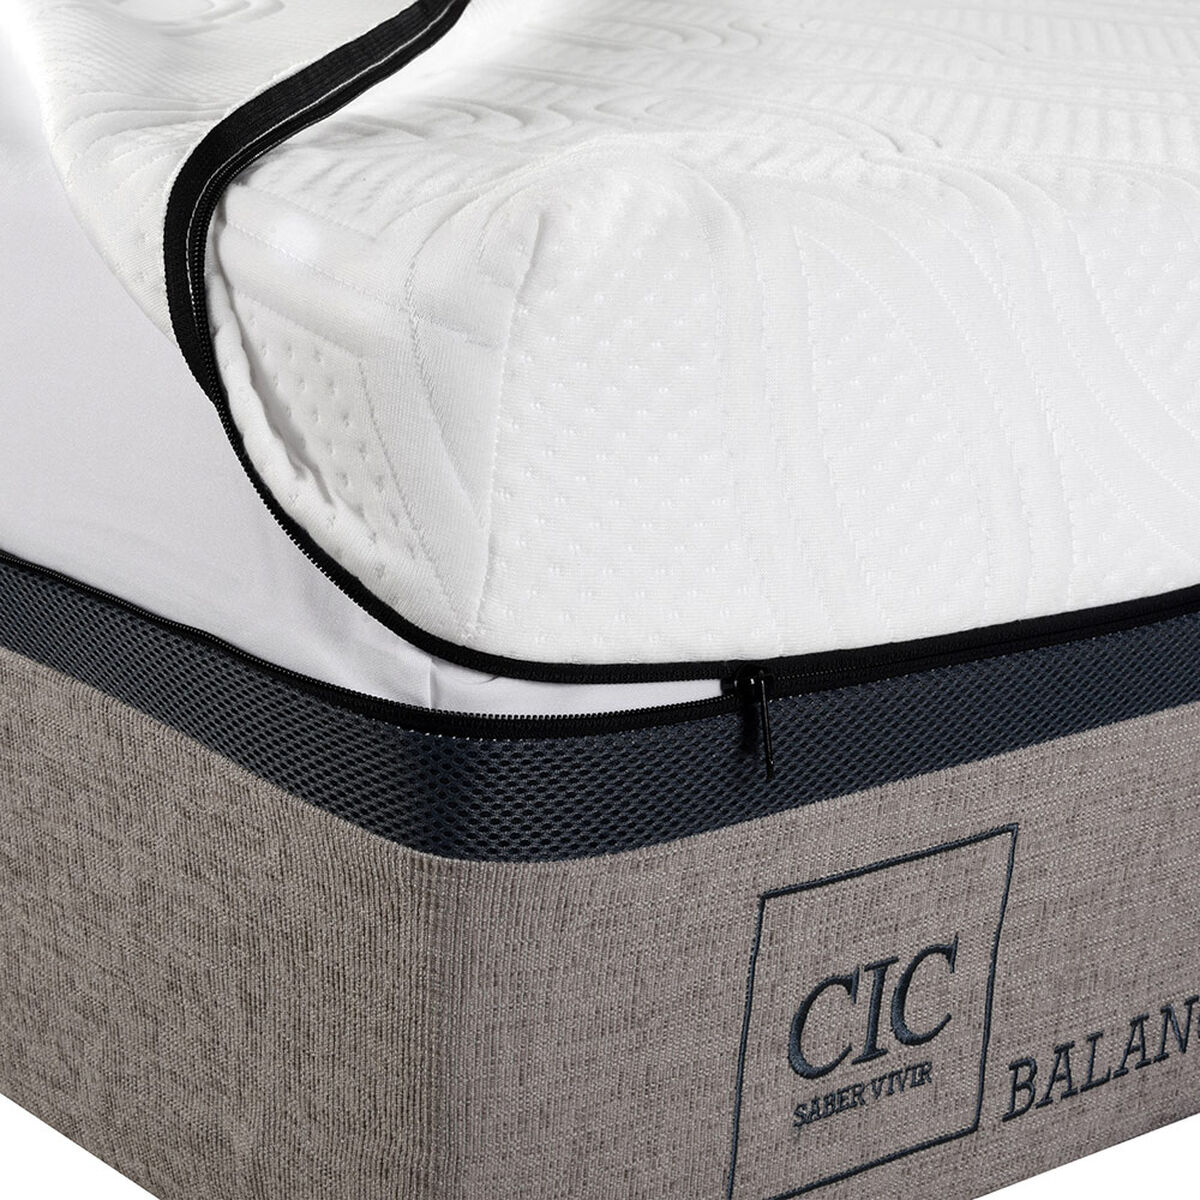 Colchón CIC King Balance